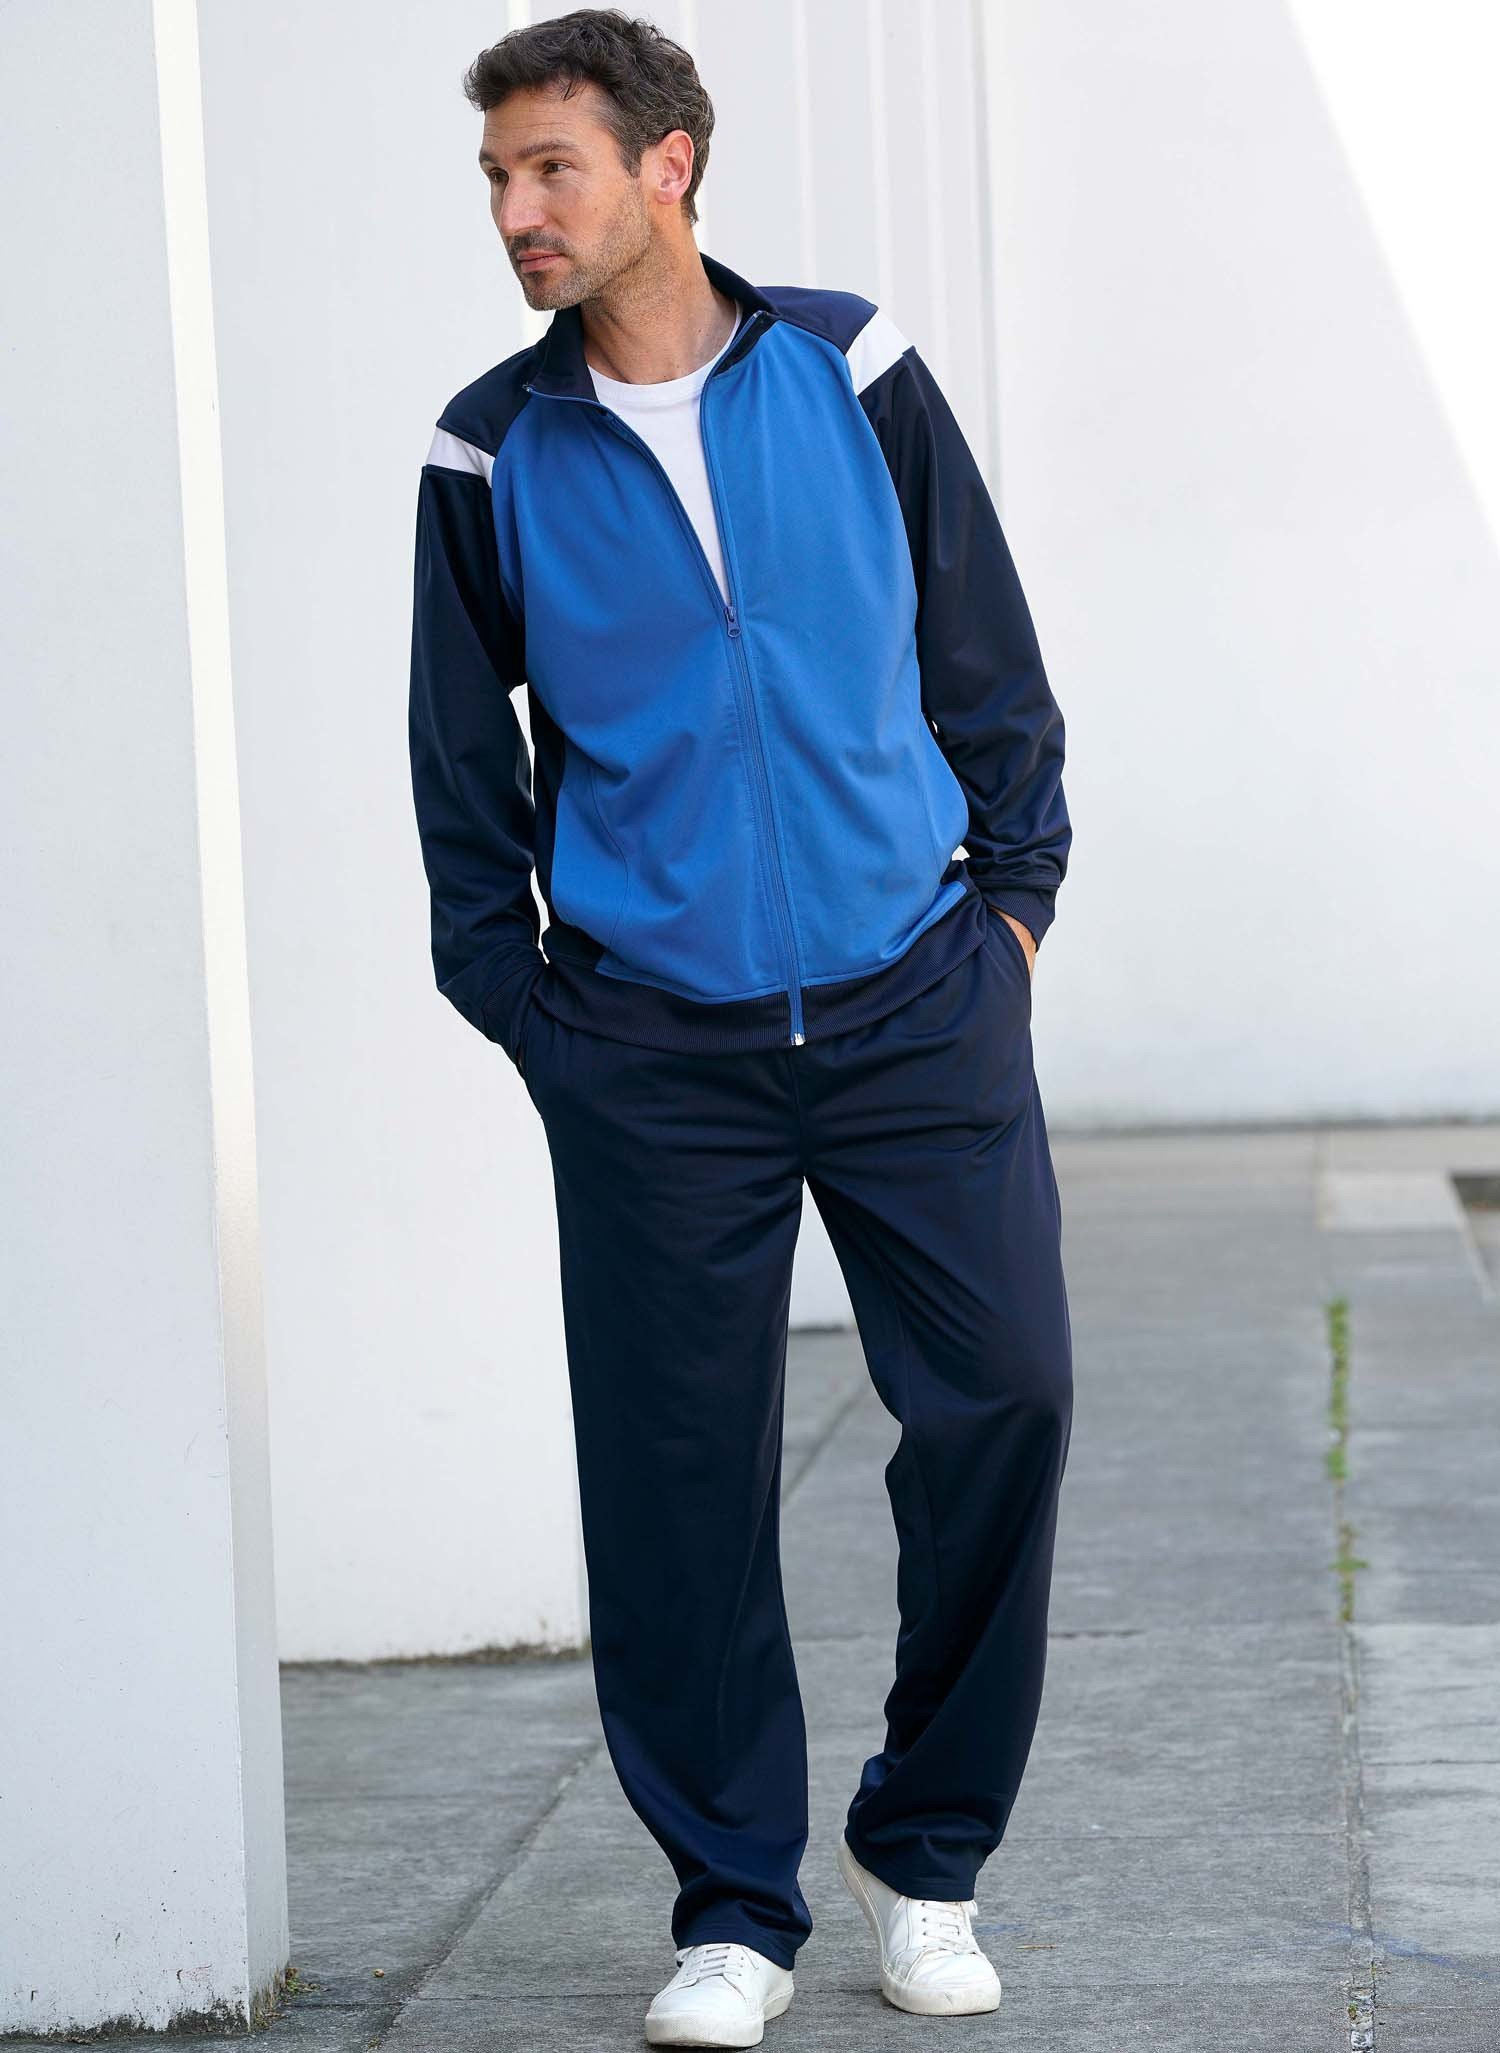 H-Jogging-Anzug marine/k'blau XXL 052 - 1 - Ronja.ch